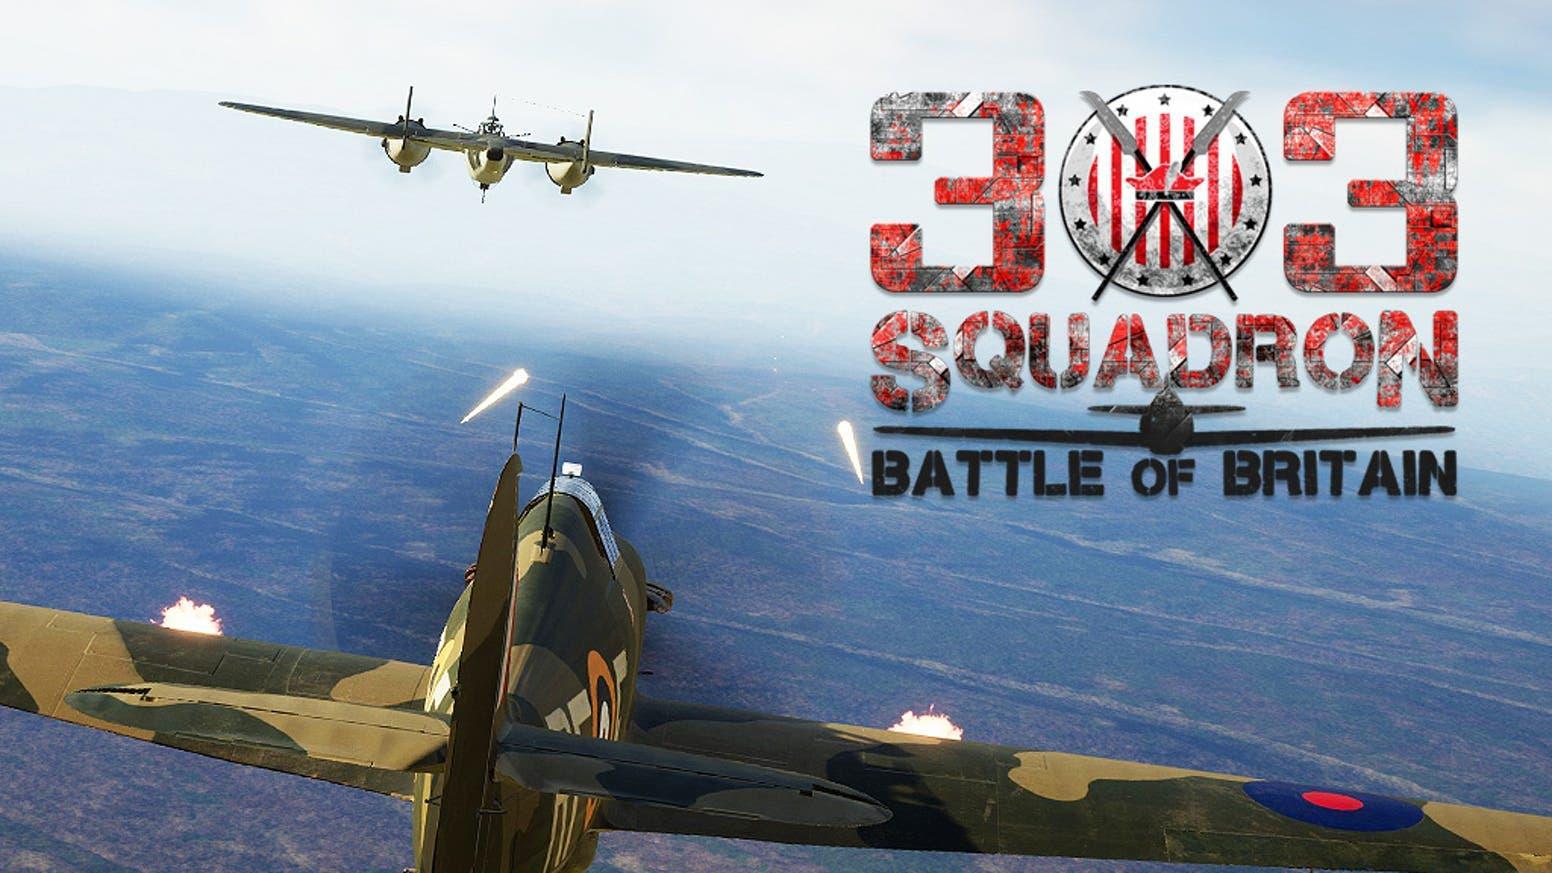 303 Squadron: Battle of Britain está de camino a Nintendo Switch